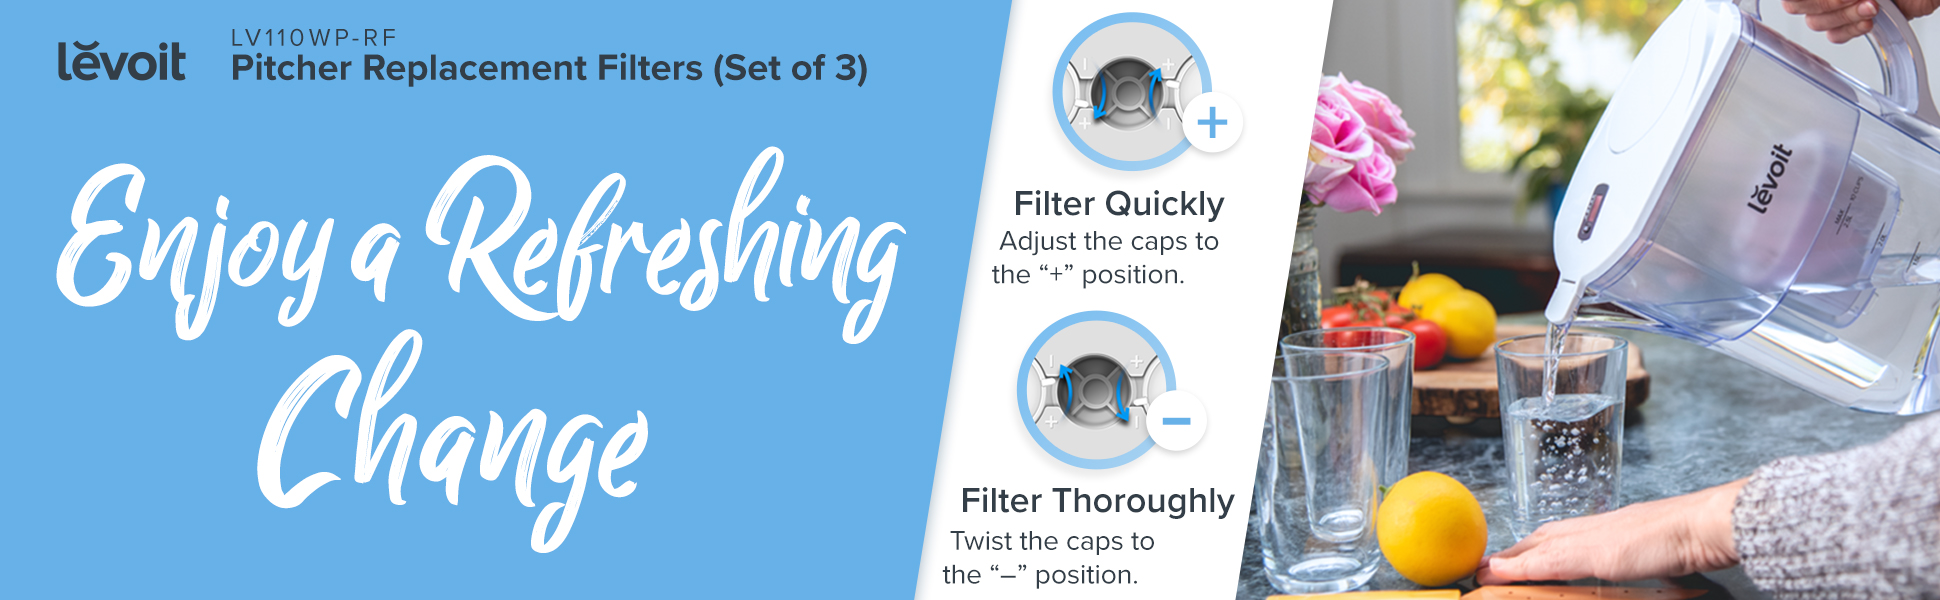 01.00_AP_EMSEAA44EL_LV110WP-RF_Water-Pitcher-Replacement-Filter_01.jpg